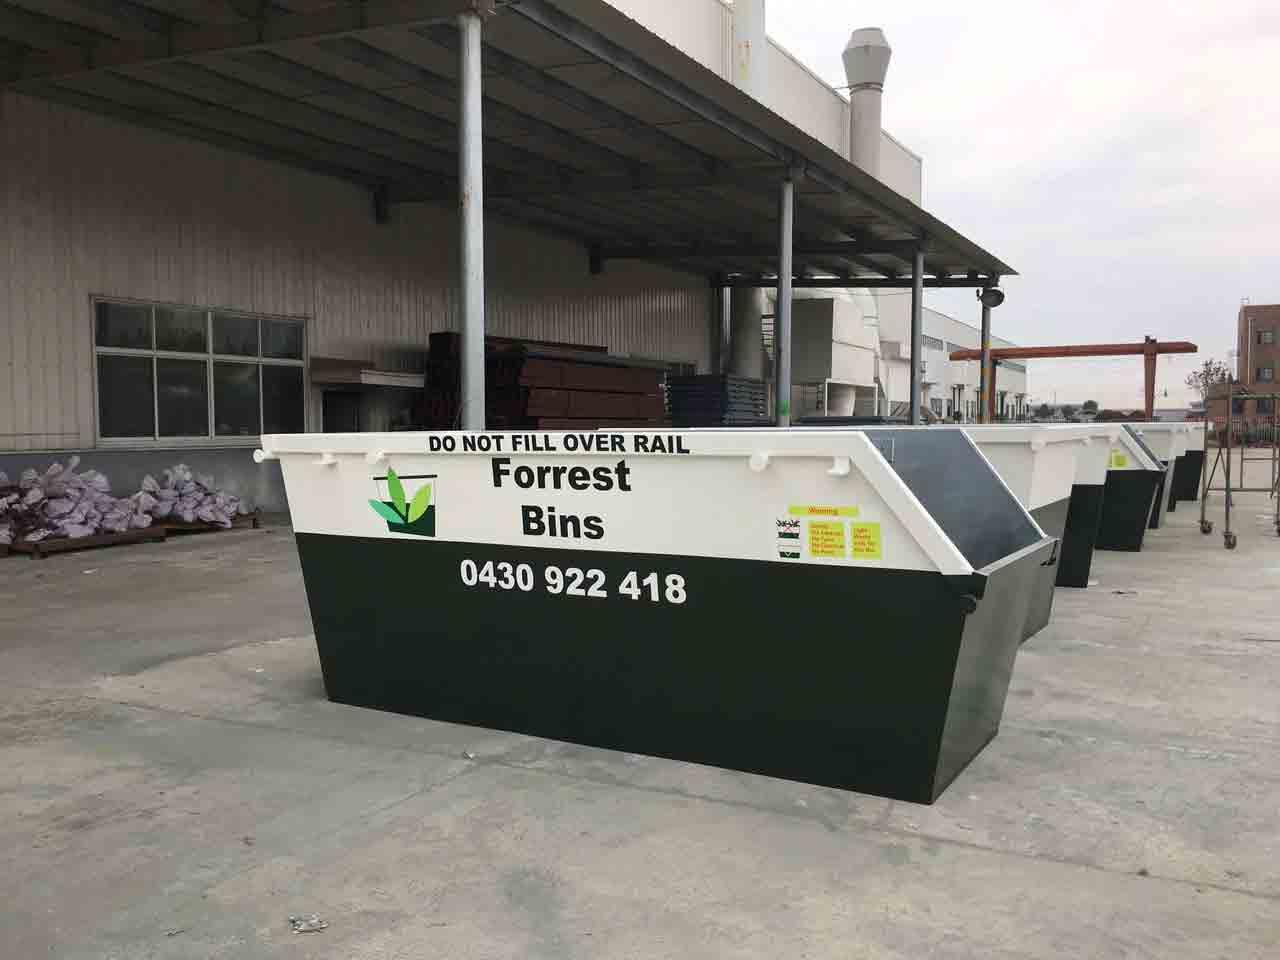 Forrest bins Forrest bins for brisbane 8-Cubic-Meter-Bin-7